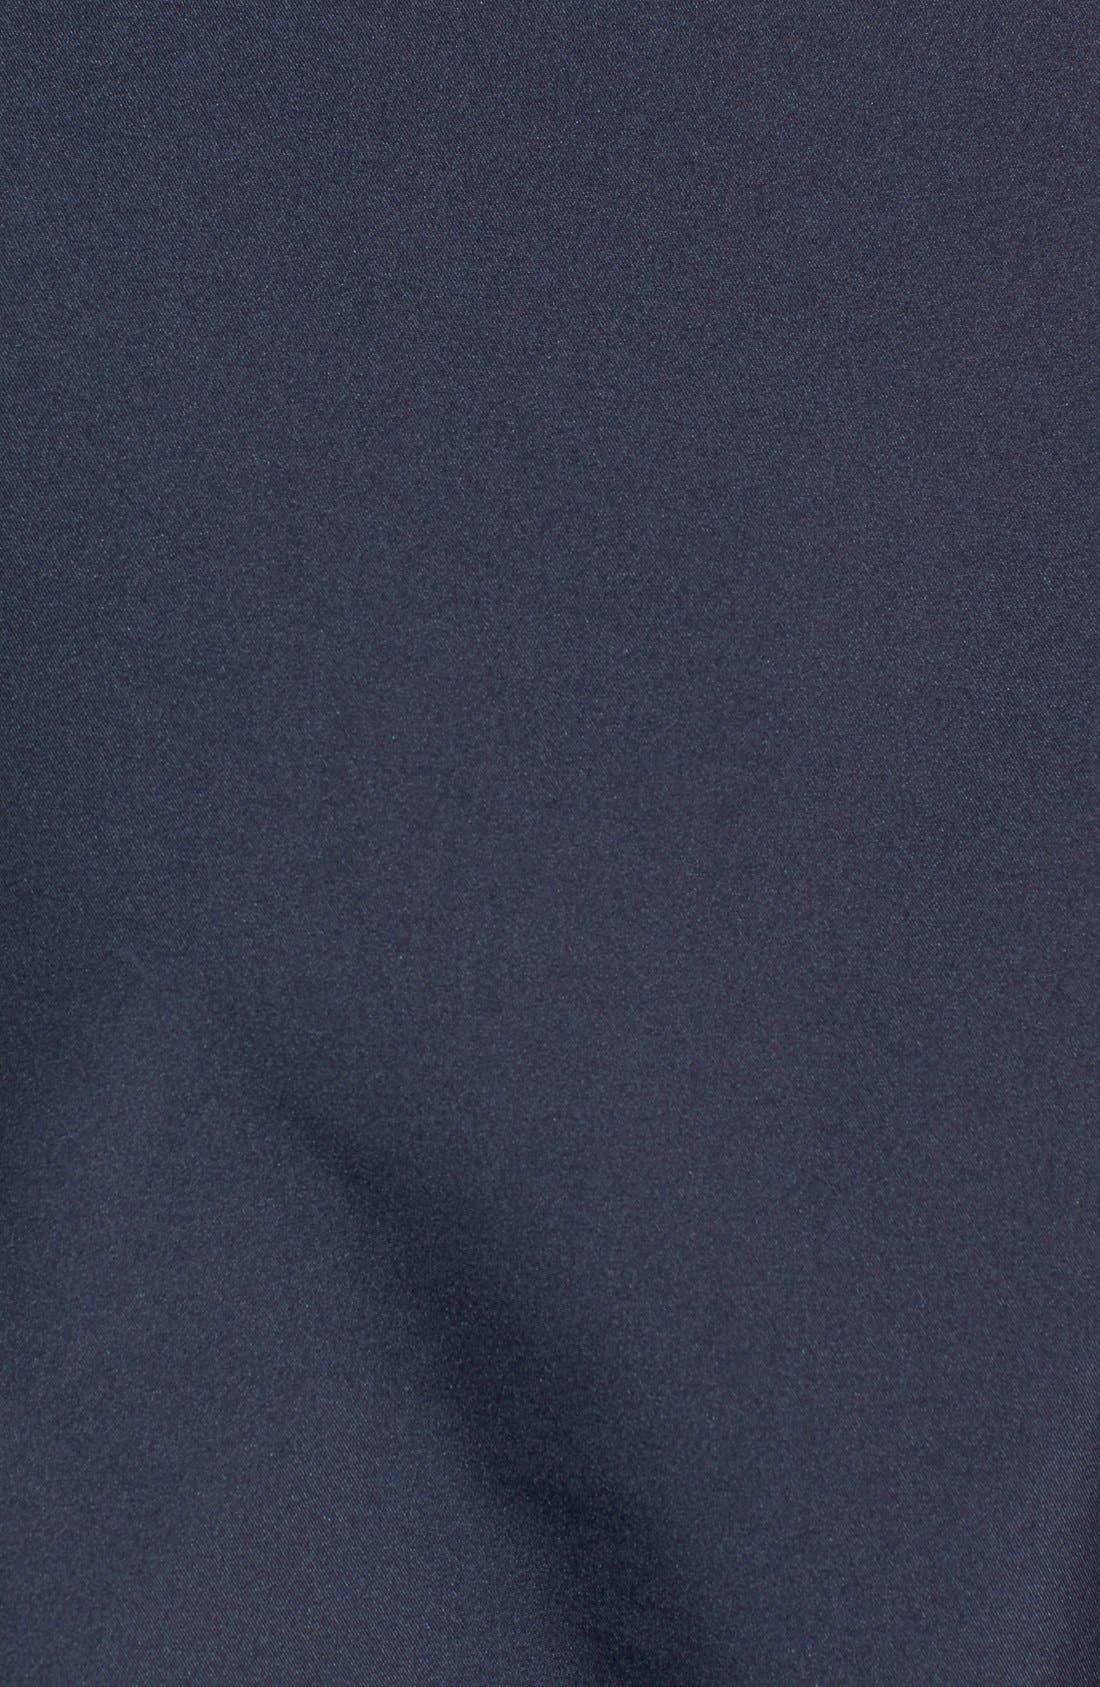 New England Patriots - Beacon WeatherTec Wind & Water Resistant Jacket,                             Alternate thumbnail 3, color,                             Navy Blue